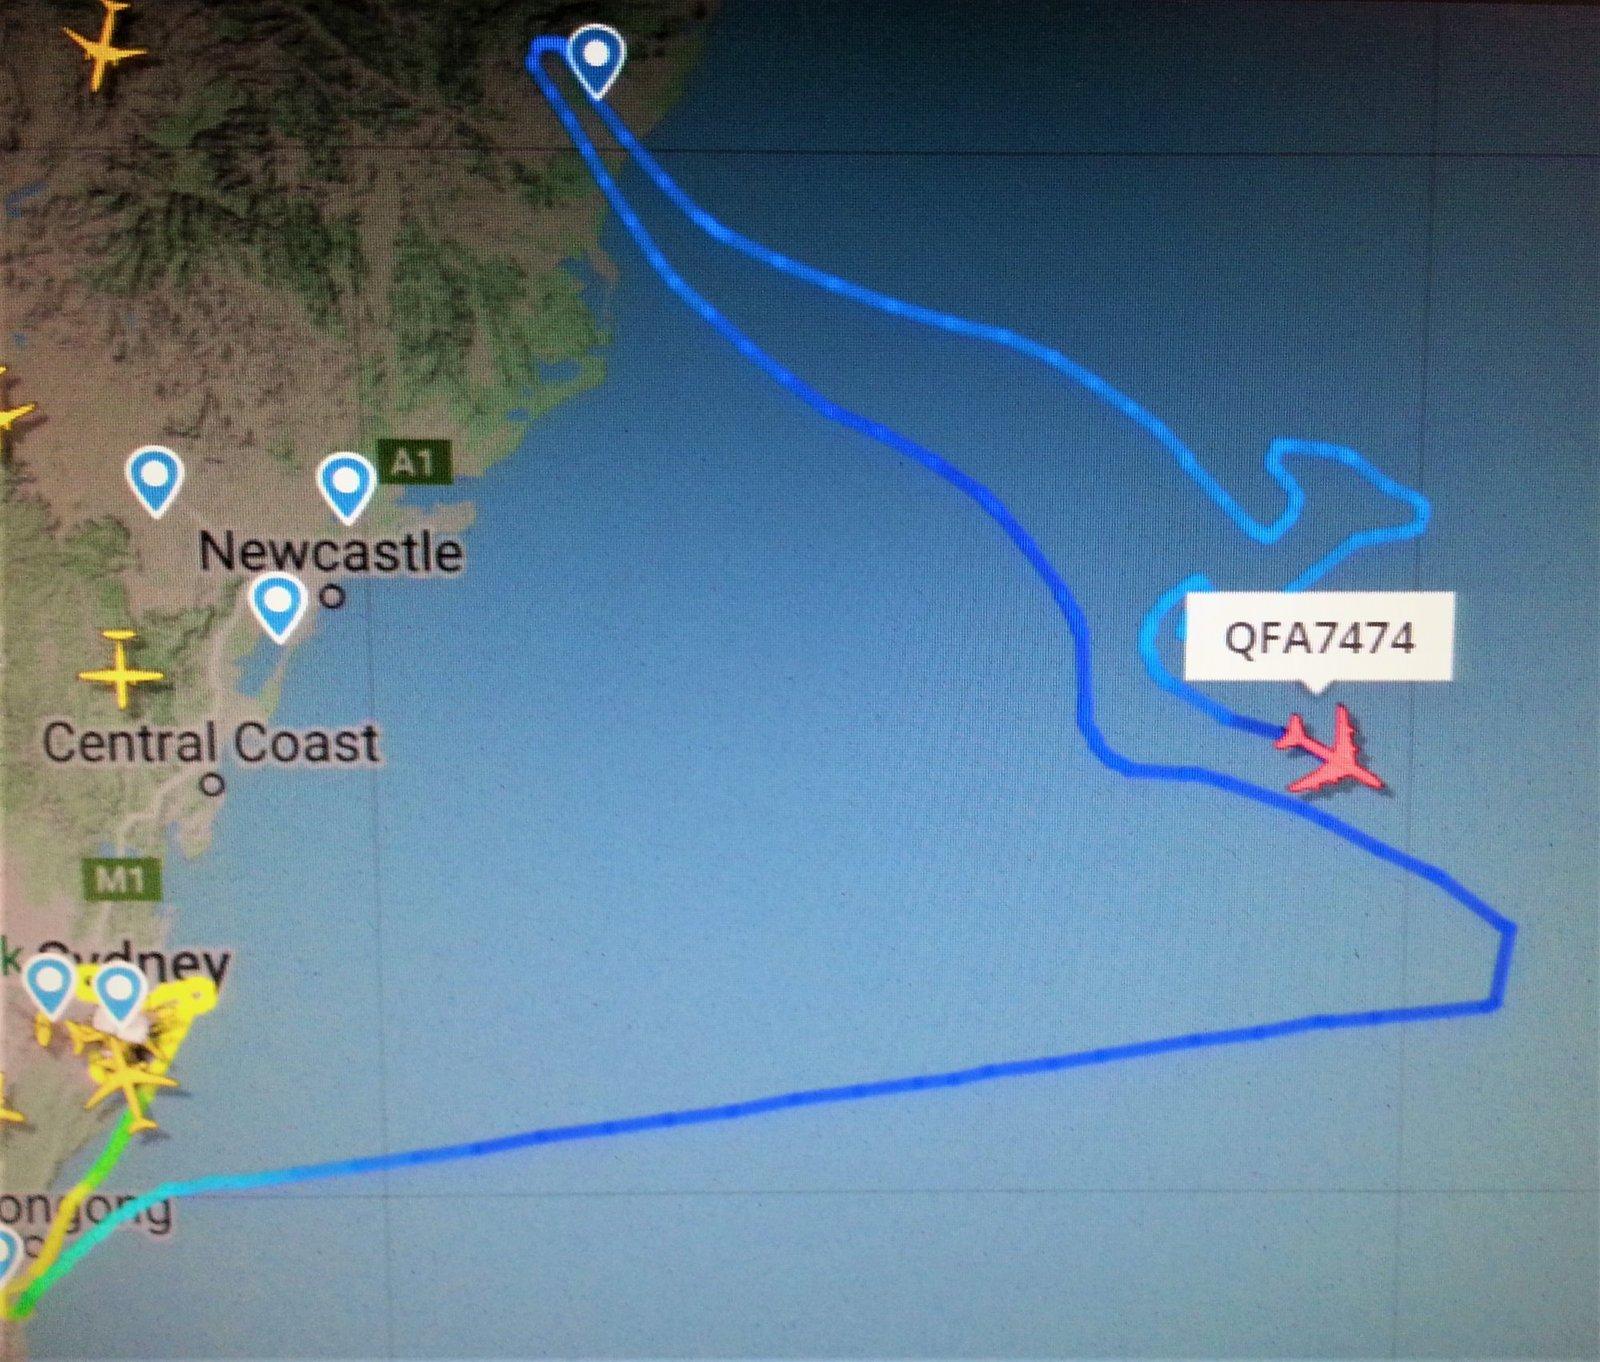 747 qf last flight 1